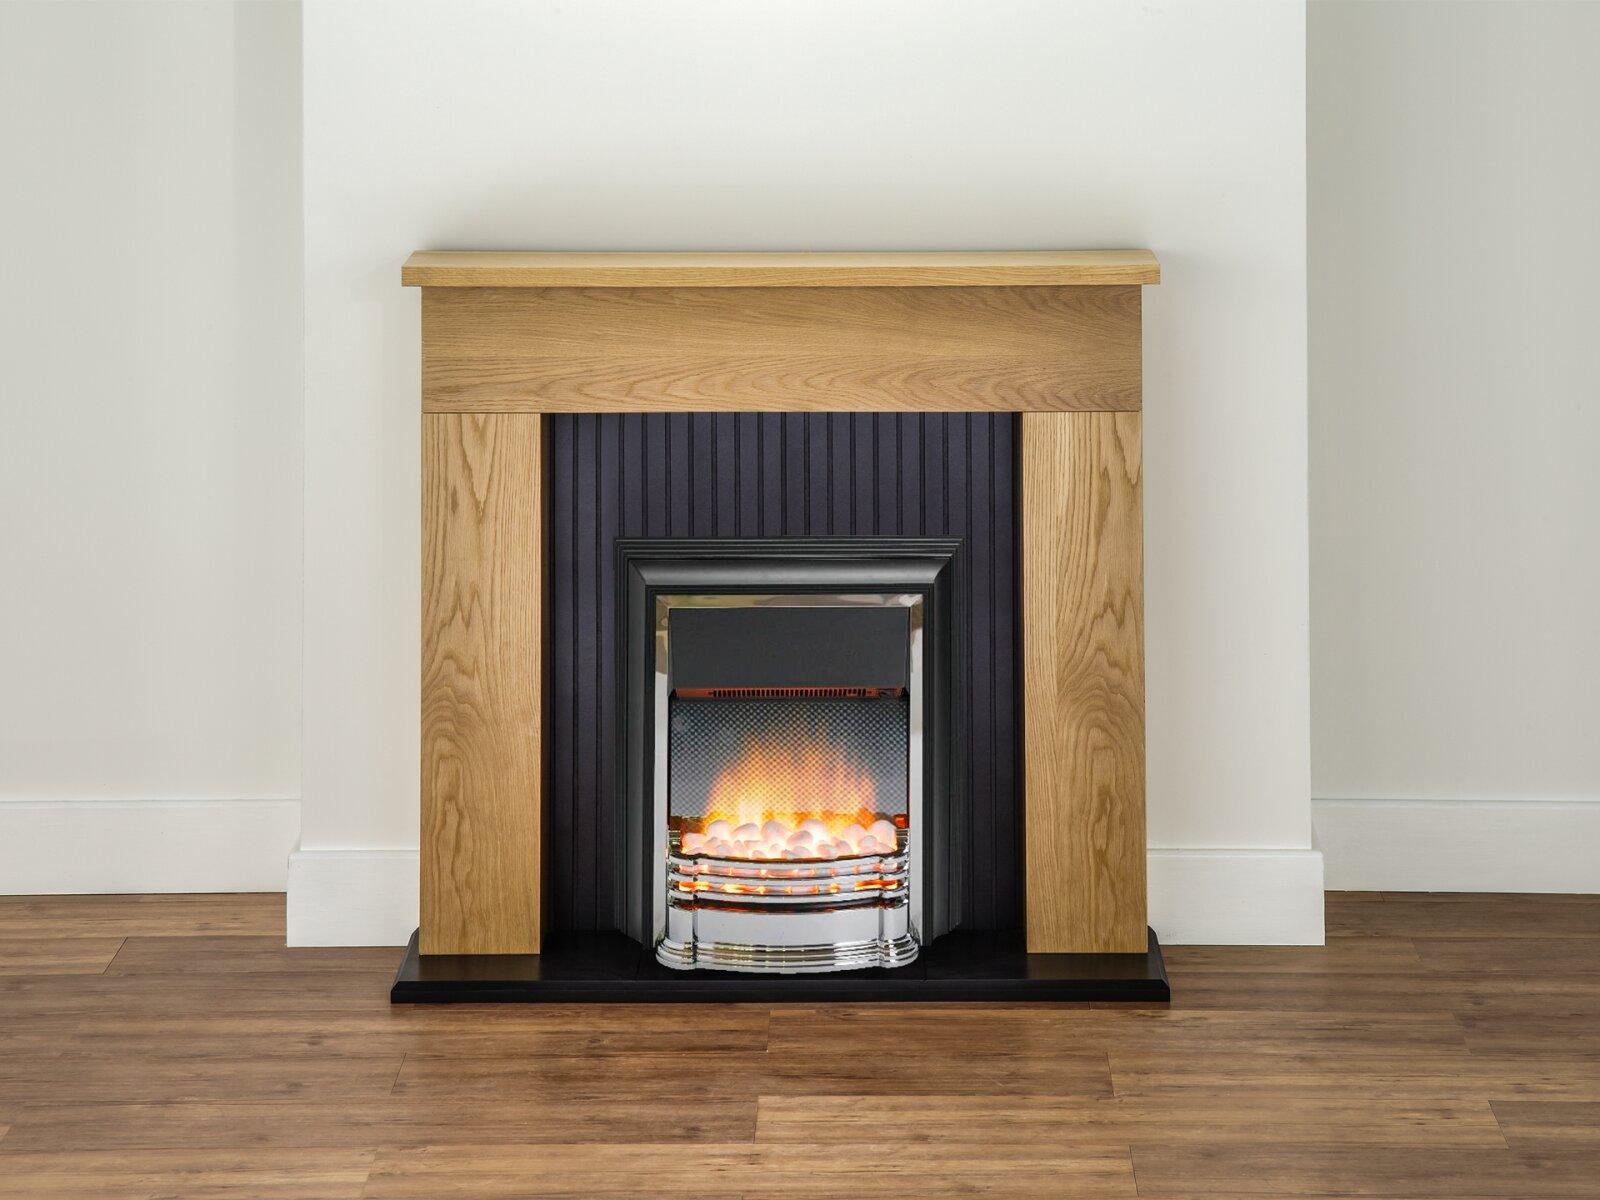 Adam Innsbruck Fireplace Suite In Oak With Dimplex Detroit Electric Fire In Chrome 48 Inch